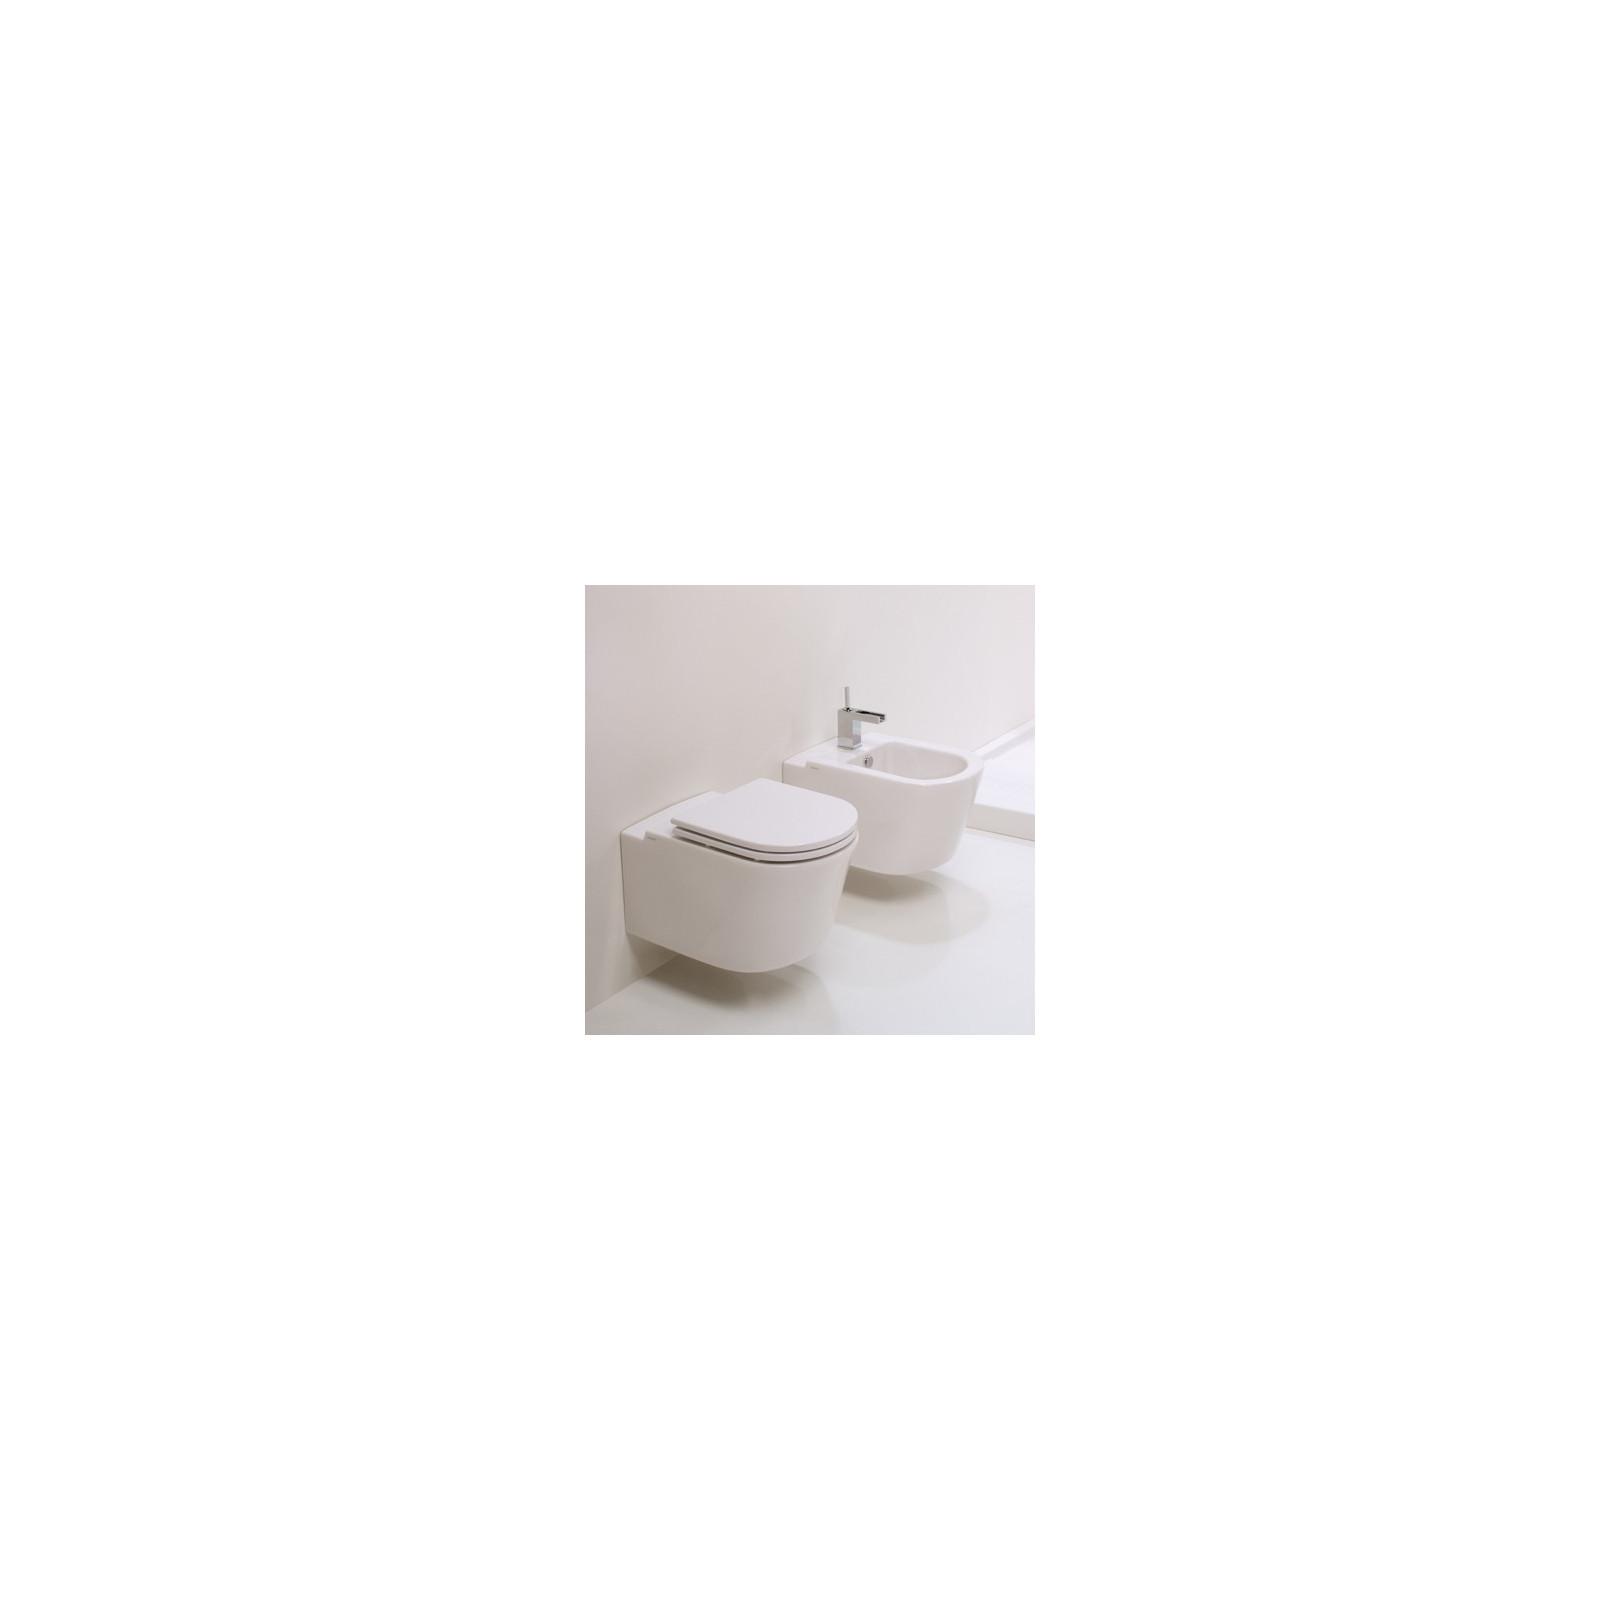 WC suspendu Race 55cmx36cm avec abattant, RAWCSO